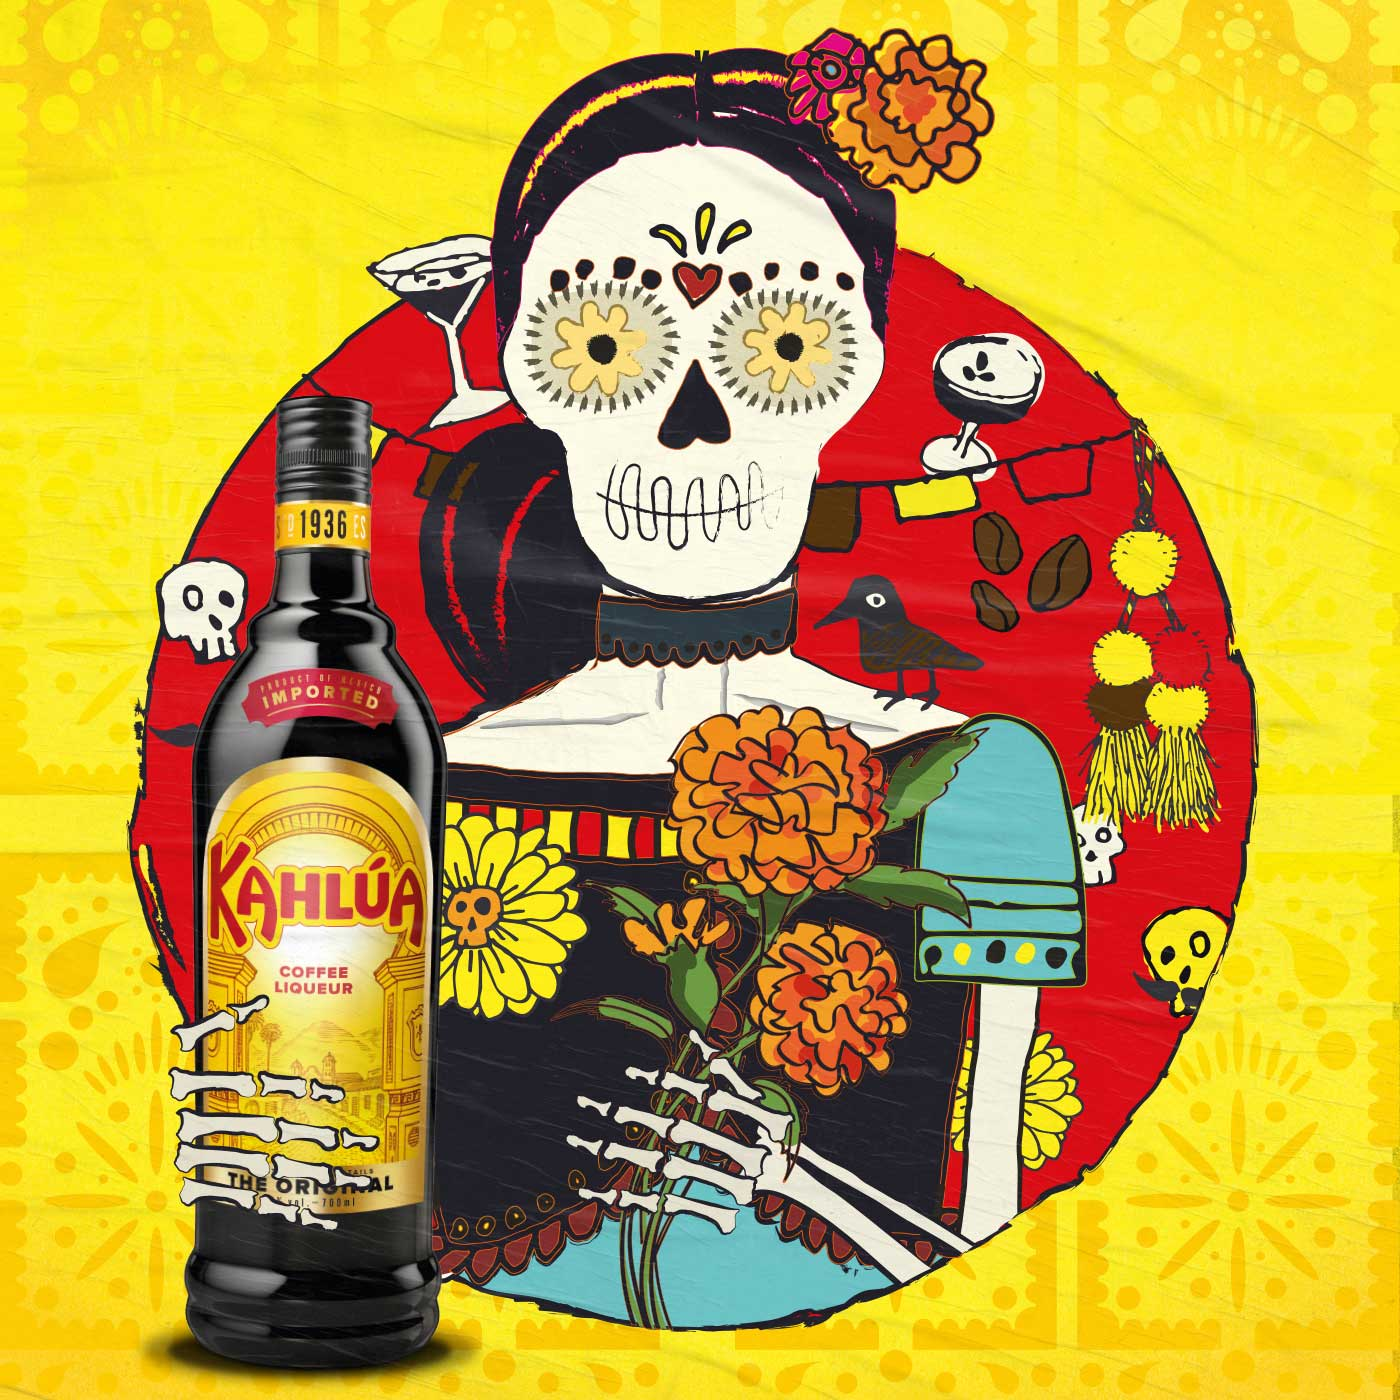 Kahlua-Key-visula-Day-of-the-dead-Ronny-Bergfeldt.jpg